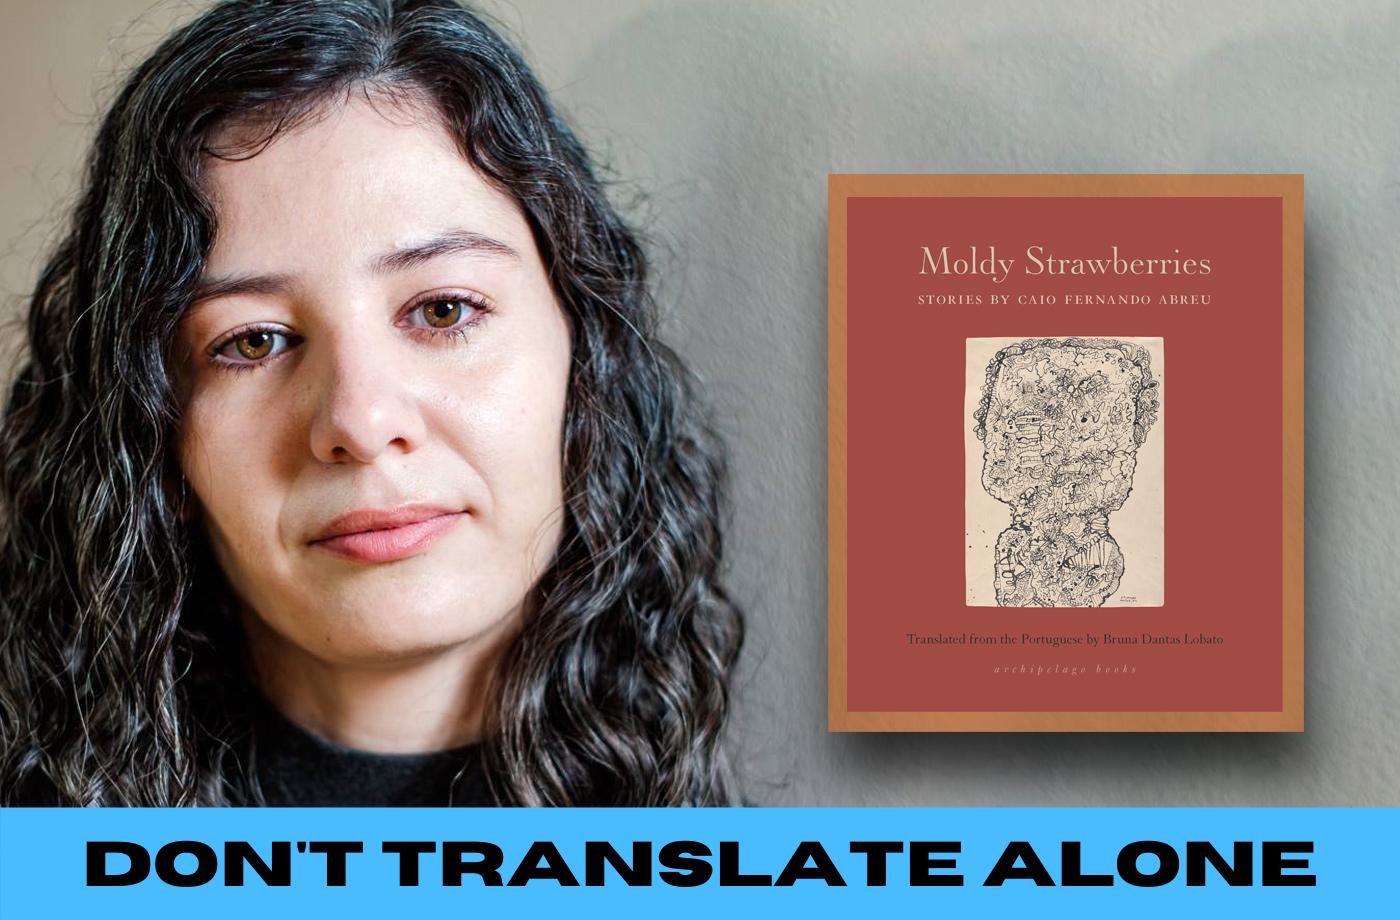 Catapult online classes: Bruna Dantas Lobato, 2-Day Online Translation Intensive: Pitching Translations, Translation, Intensive